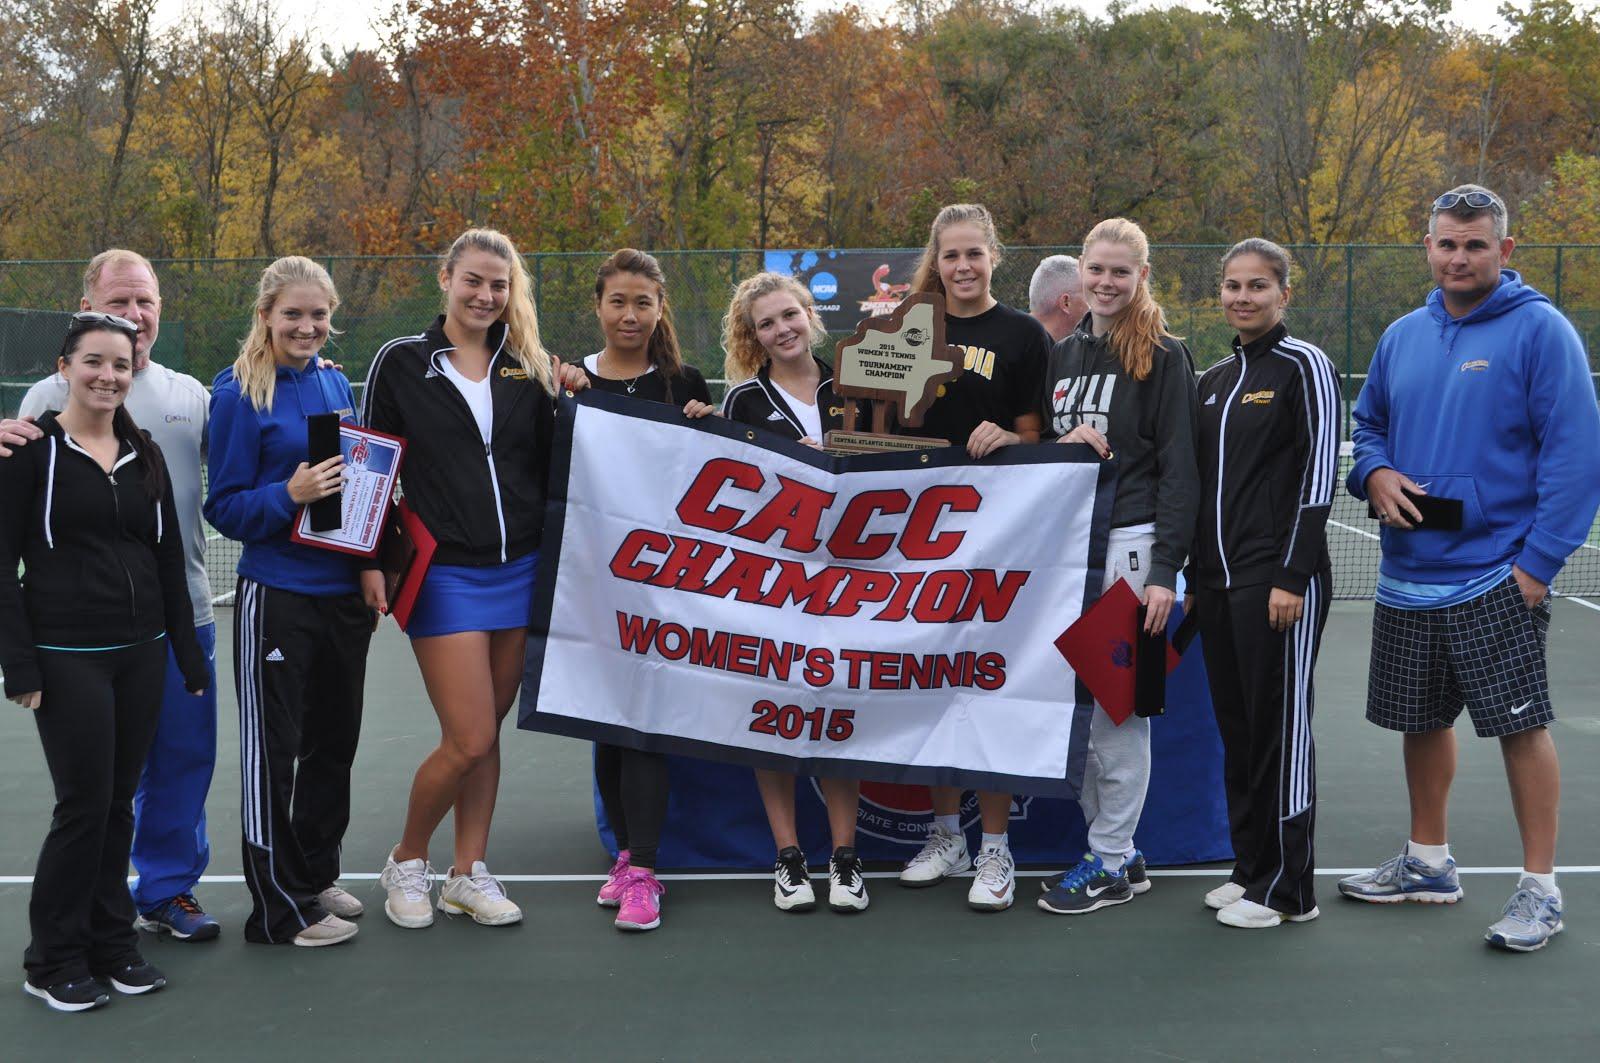 CACC Champions (W)